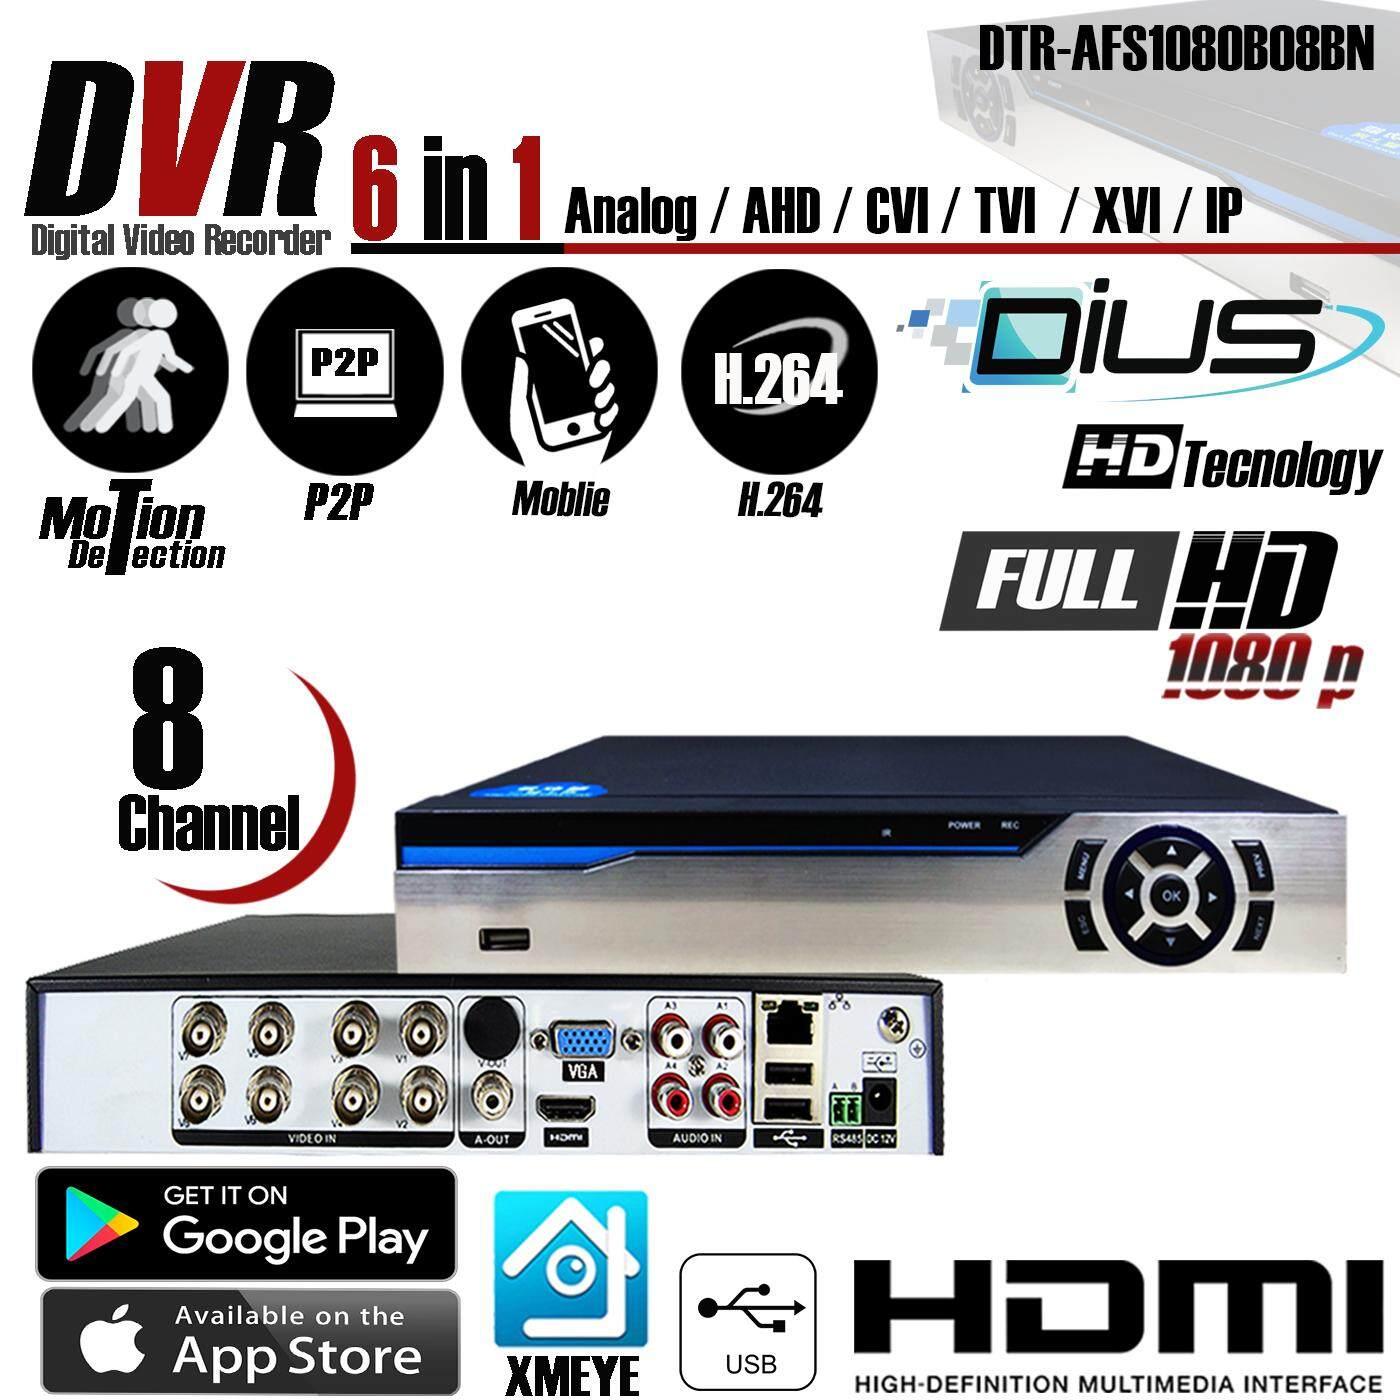 6 In 1 เครื่องบันทึกภาพ Dvr Full Hd 1080p 8 Ch รุ่น Dius ( Dtr-Afs1080b08bn ) สำหรับกล้องวงจรปิด 6 ระบบ Ahd / Cvi / Tvi / Xvi / Ip / Analog By Dius Technology.